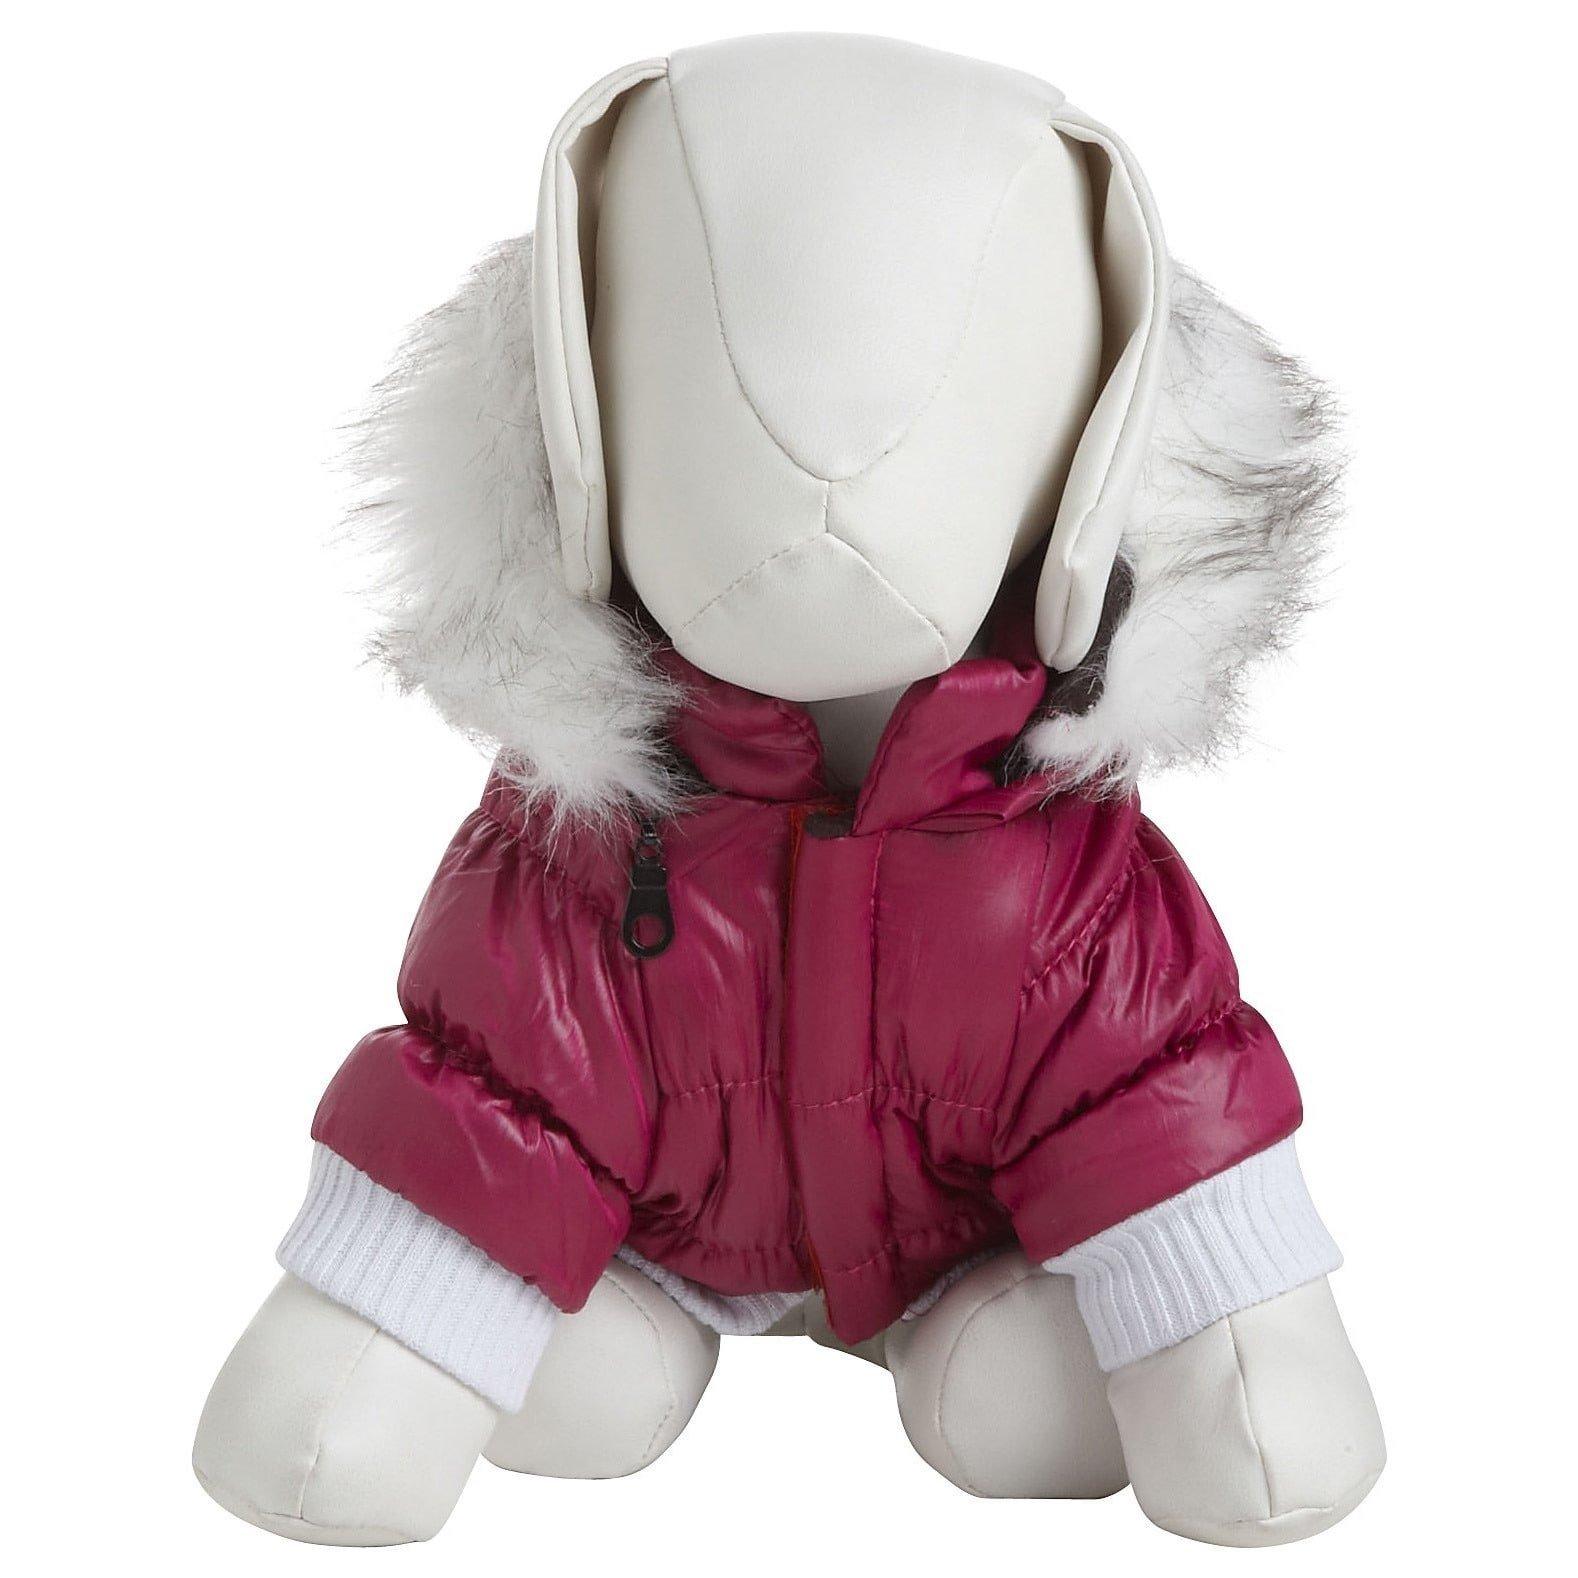 Pet Life Fashion Parka with Removable Hood - Pink Metallic - Medium